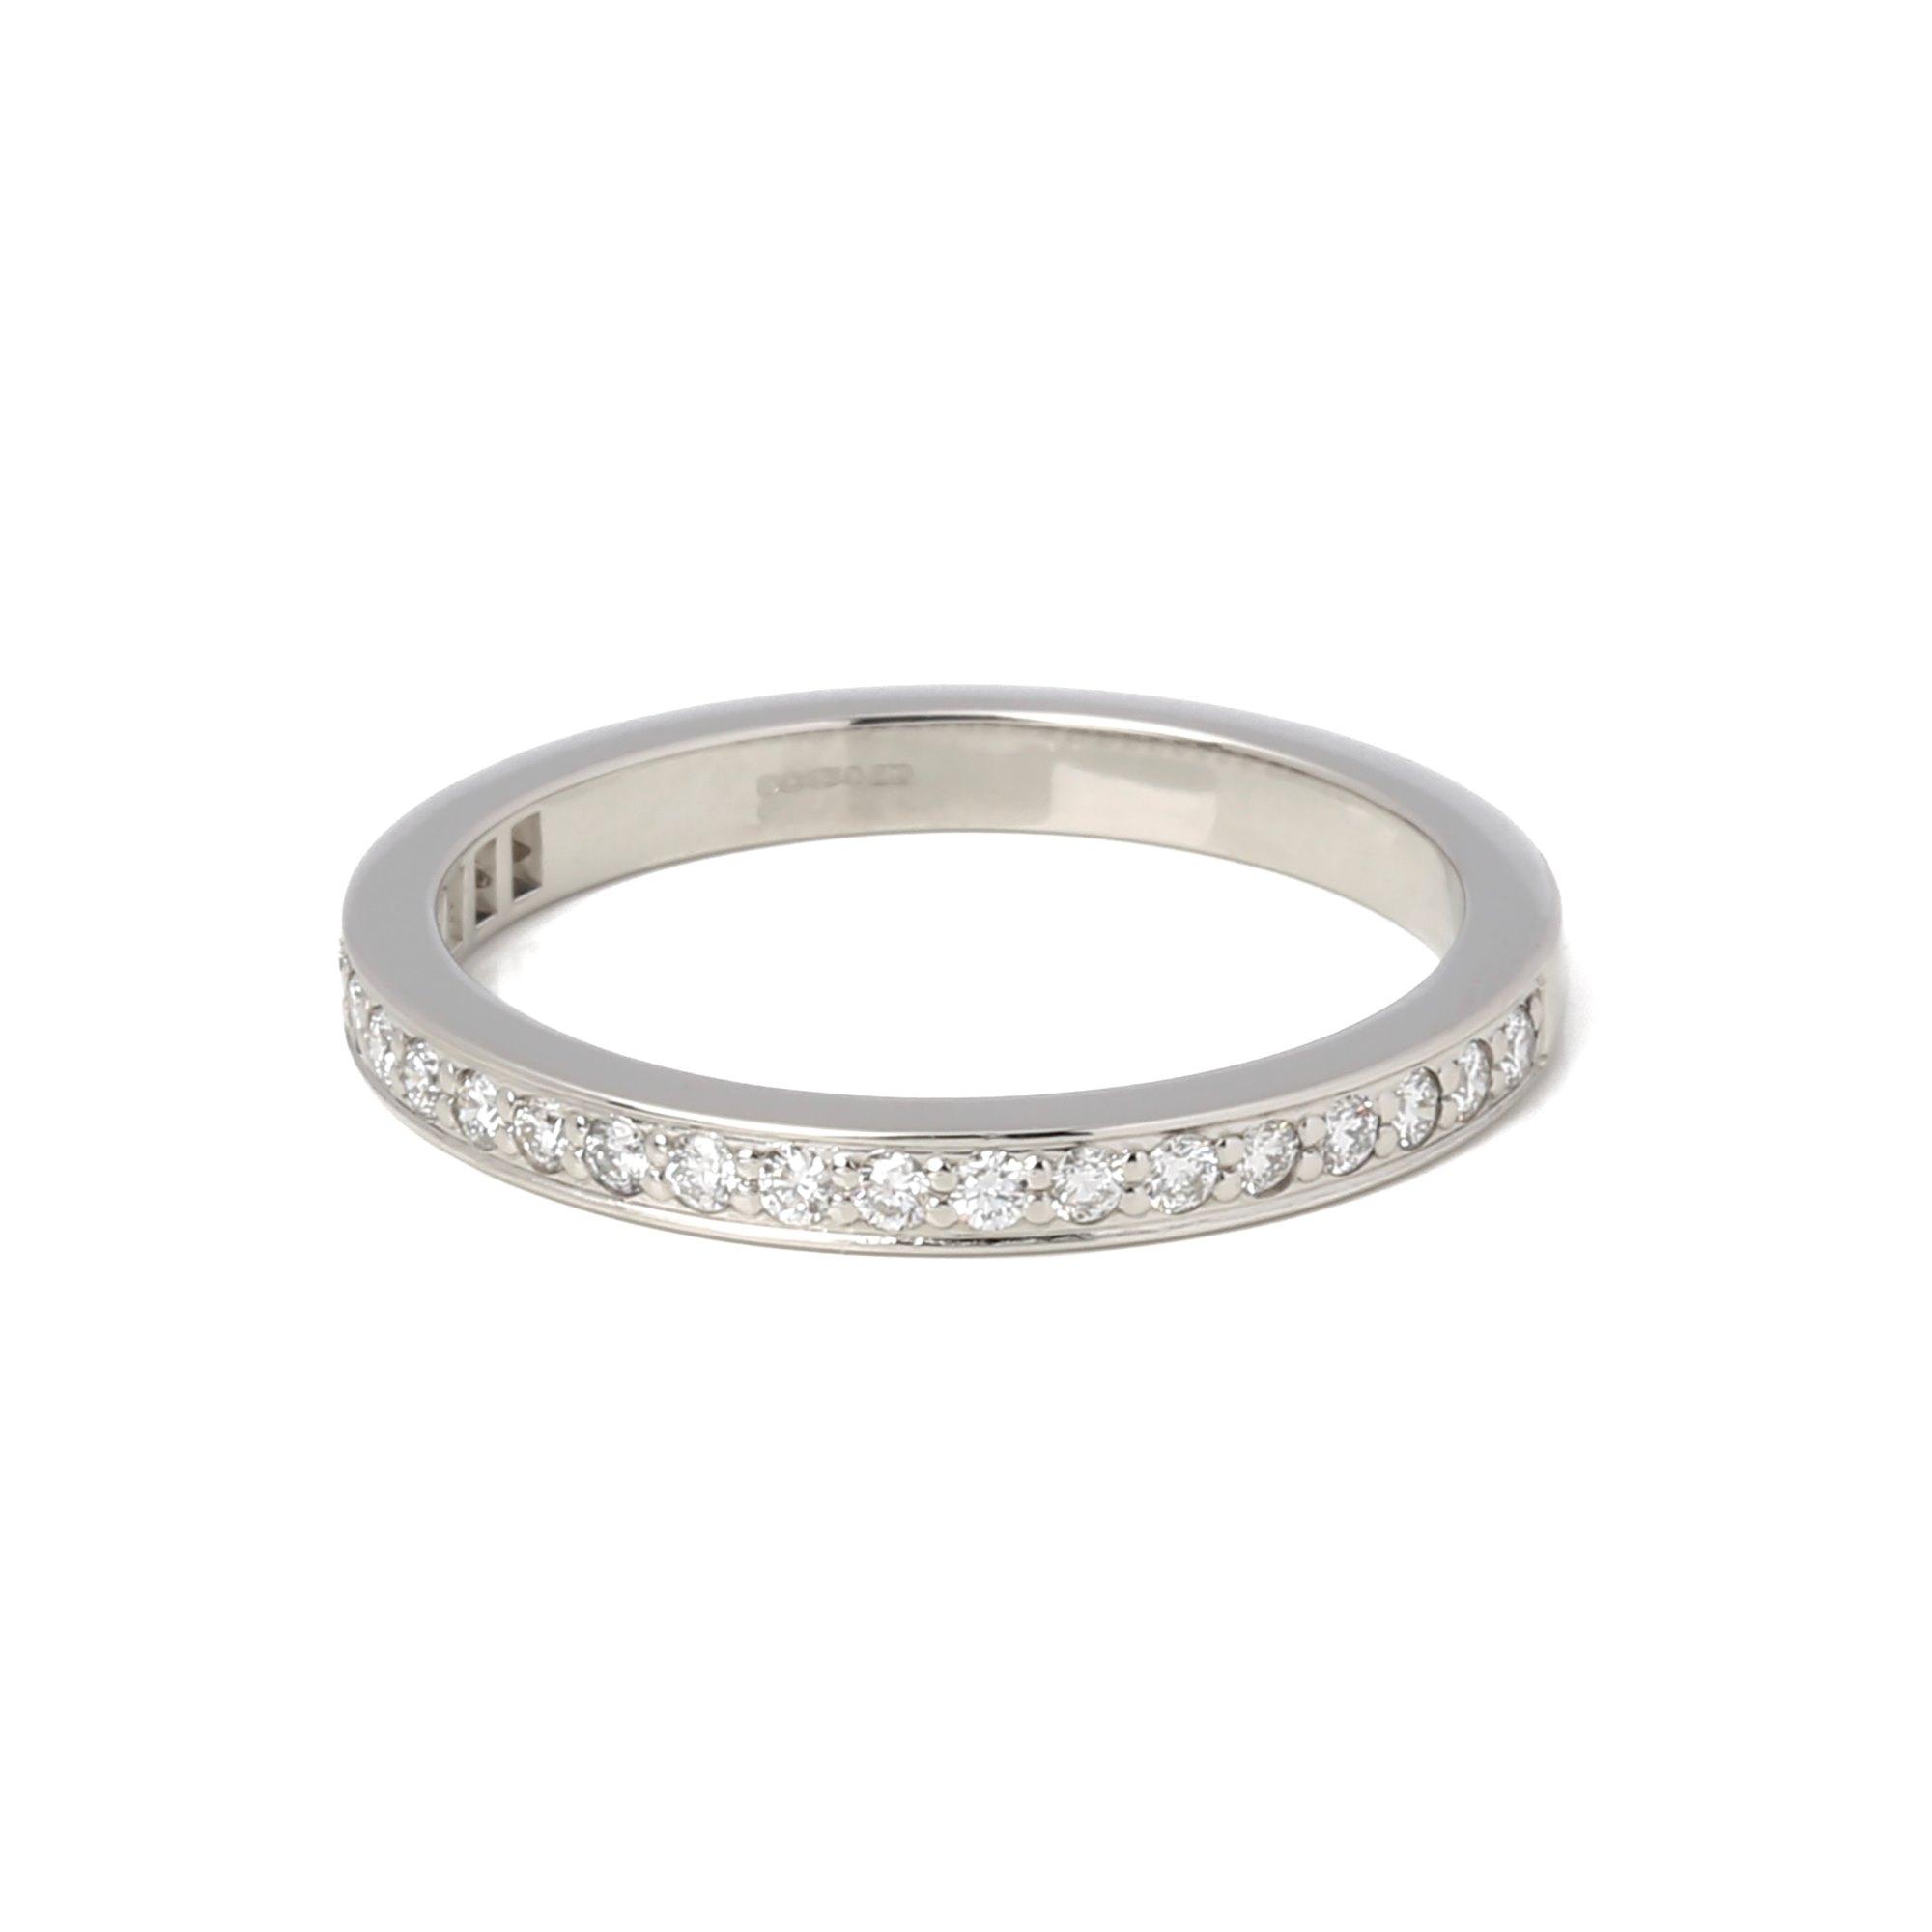 Tiffany & Co. Half Diamond Eternity Ring